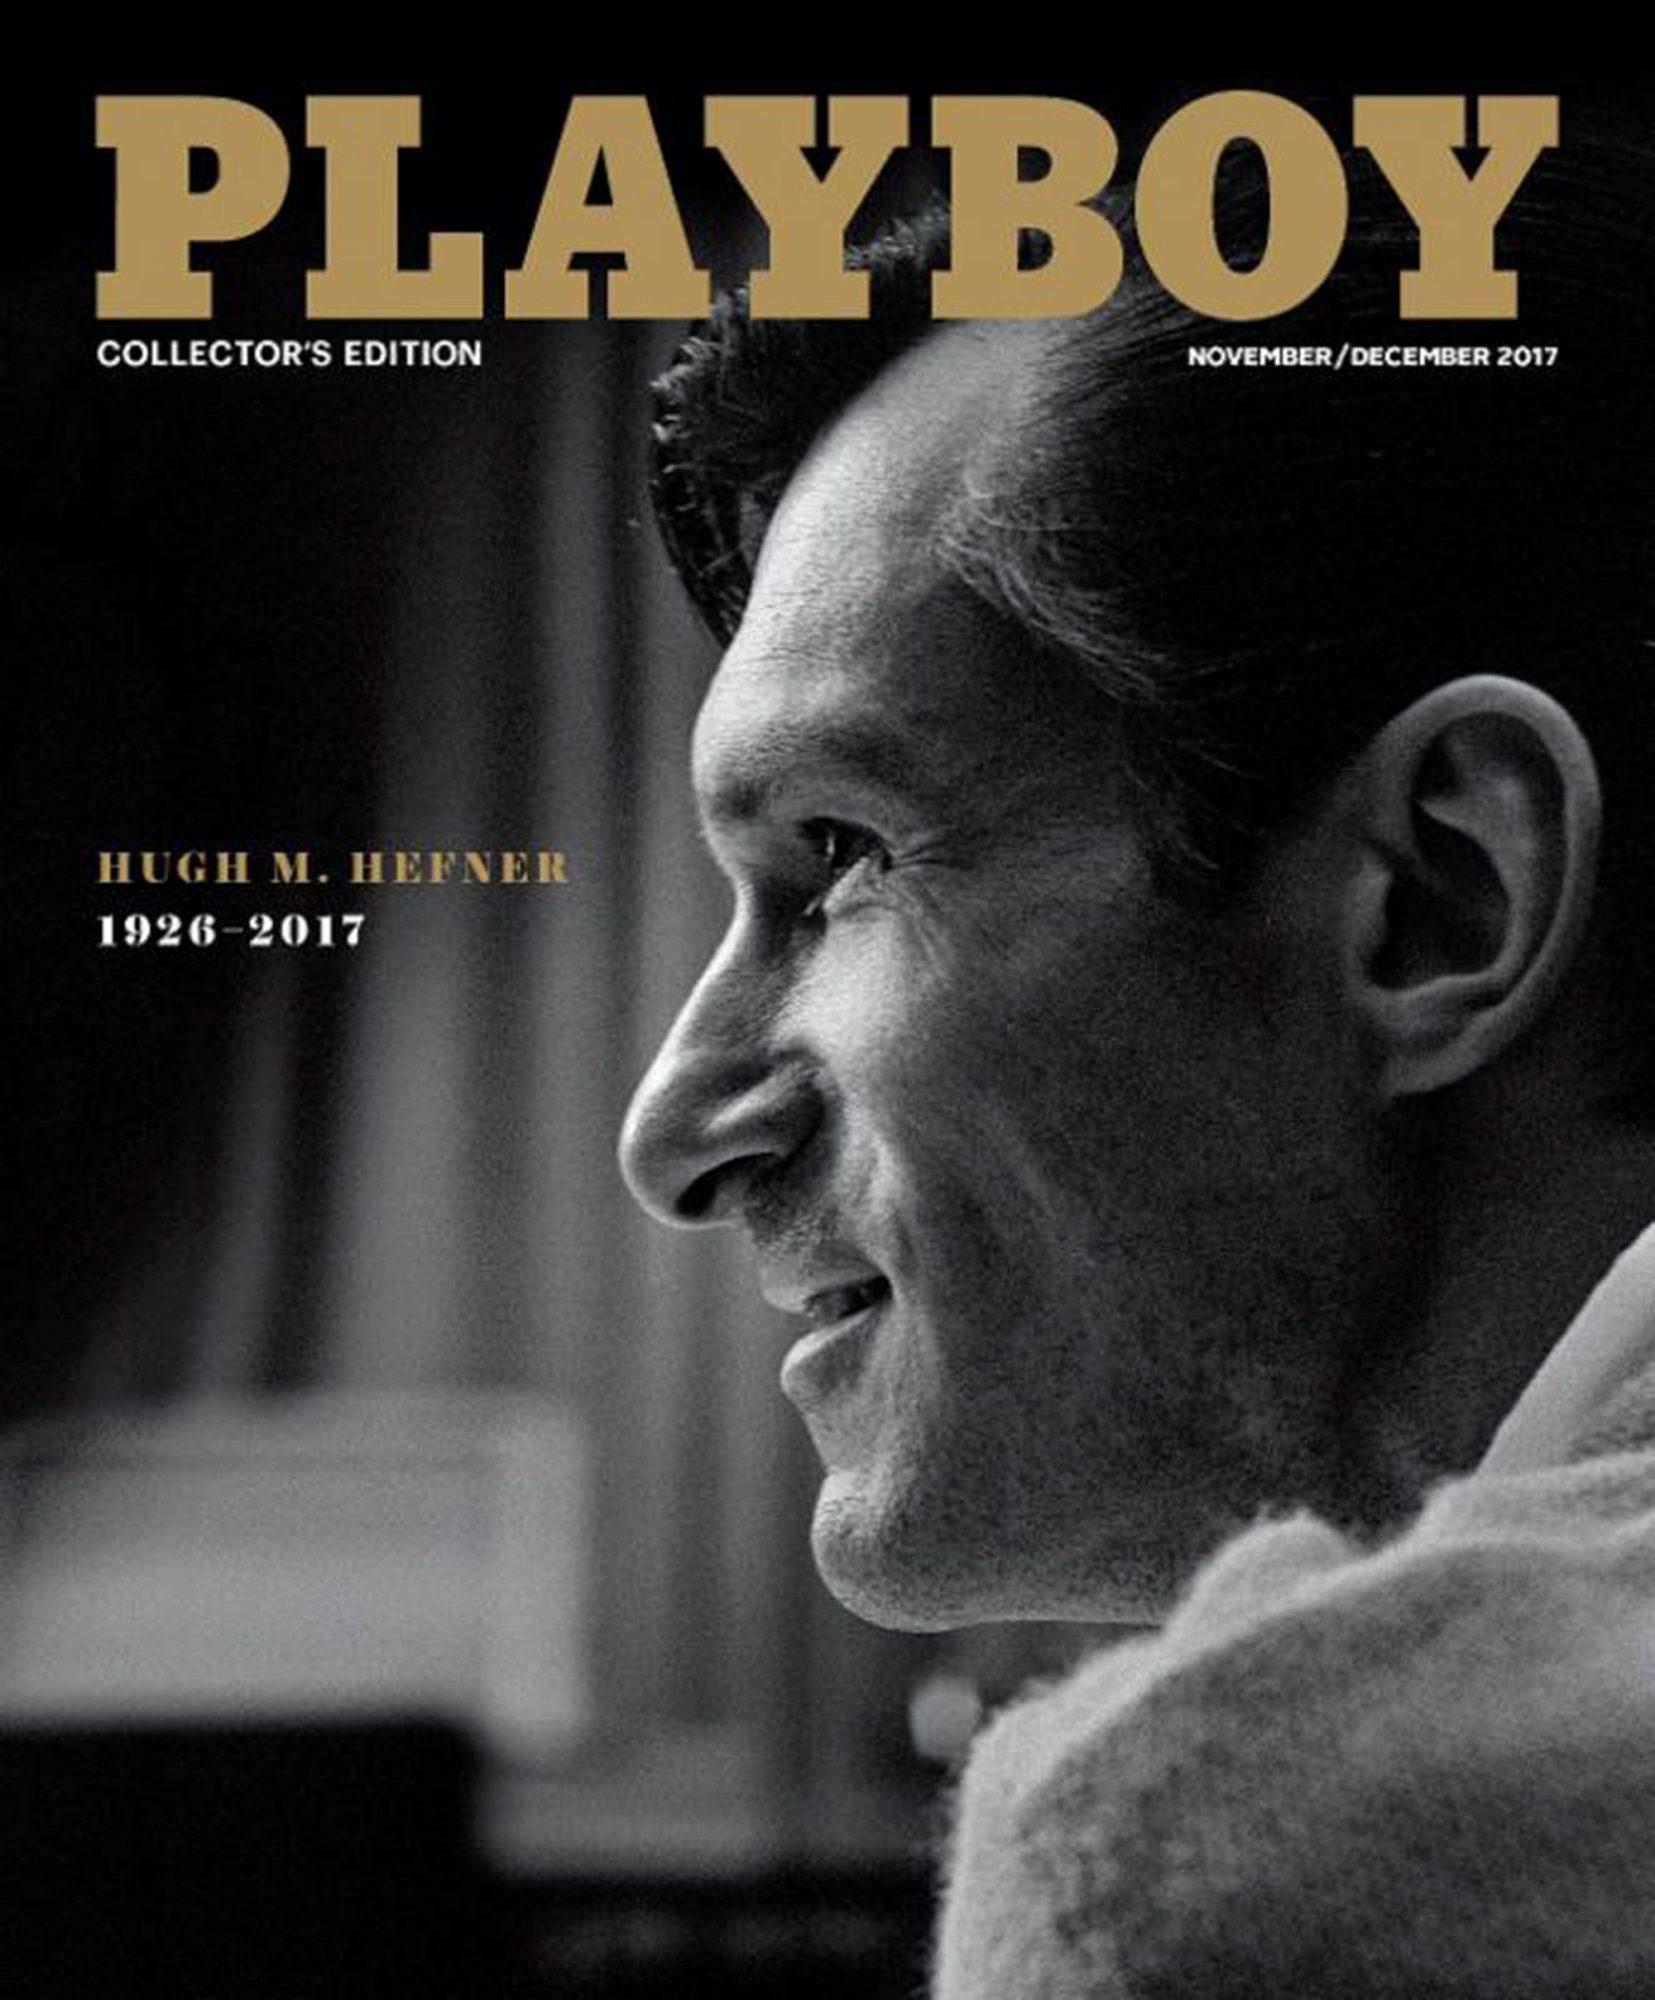 playboy-hugh-hefner-cover.jpg